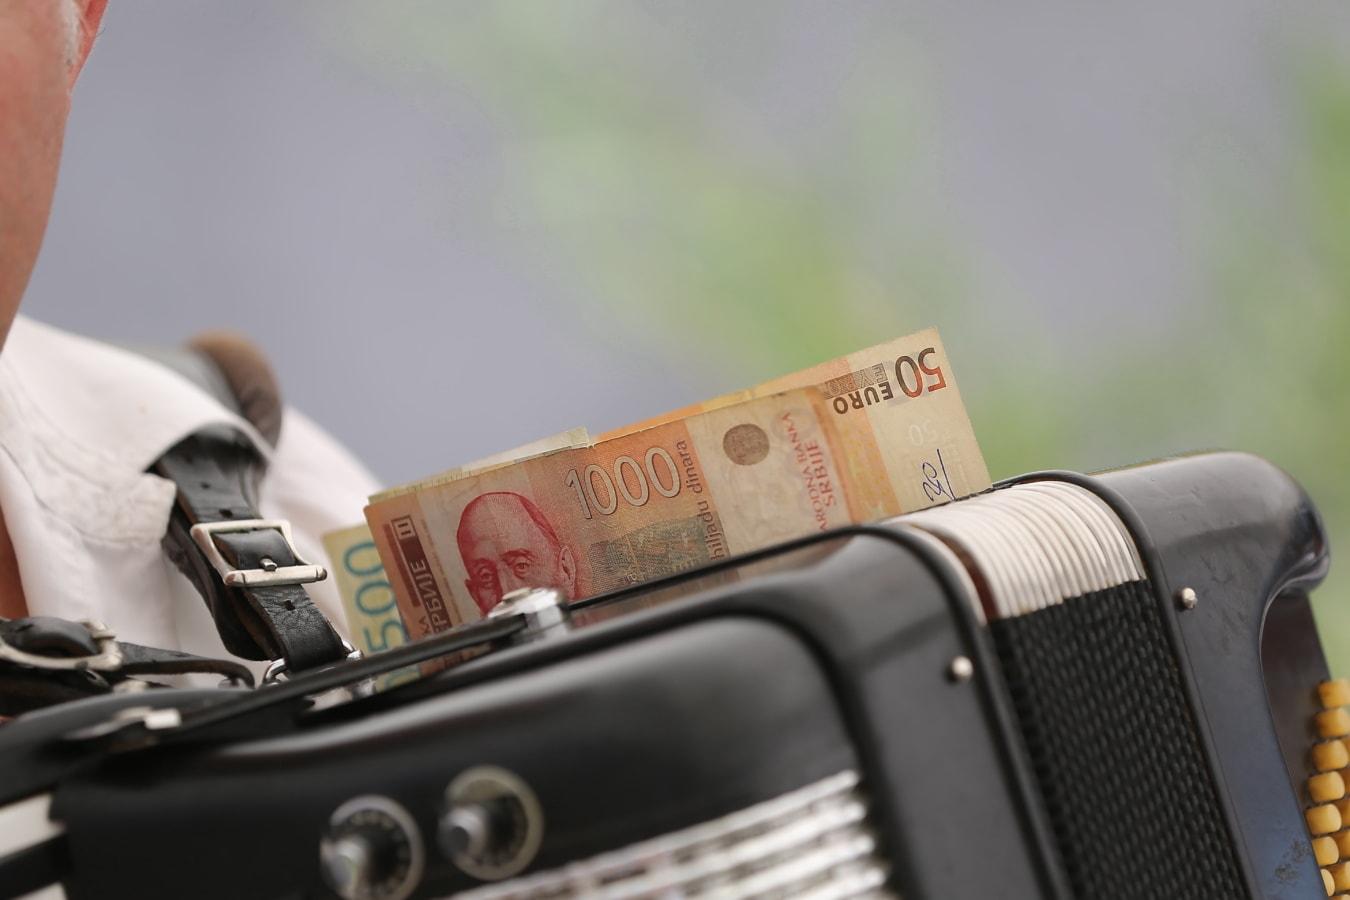 accordion, musician, music, singer, entertainment, entertainer, banknote, money, work, workman